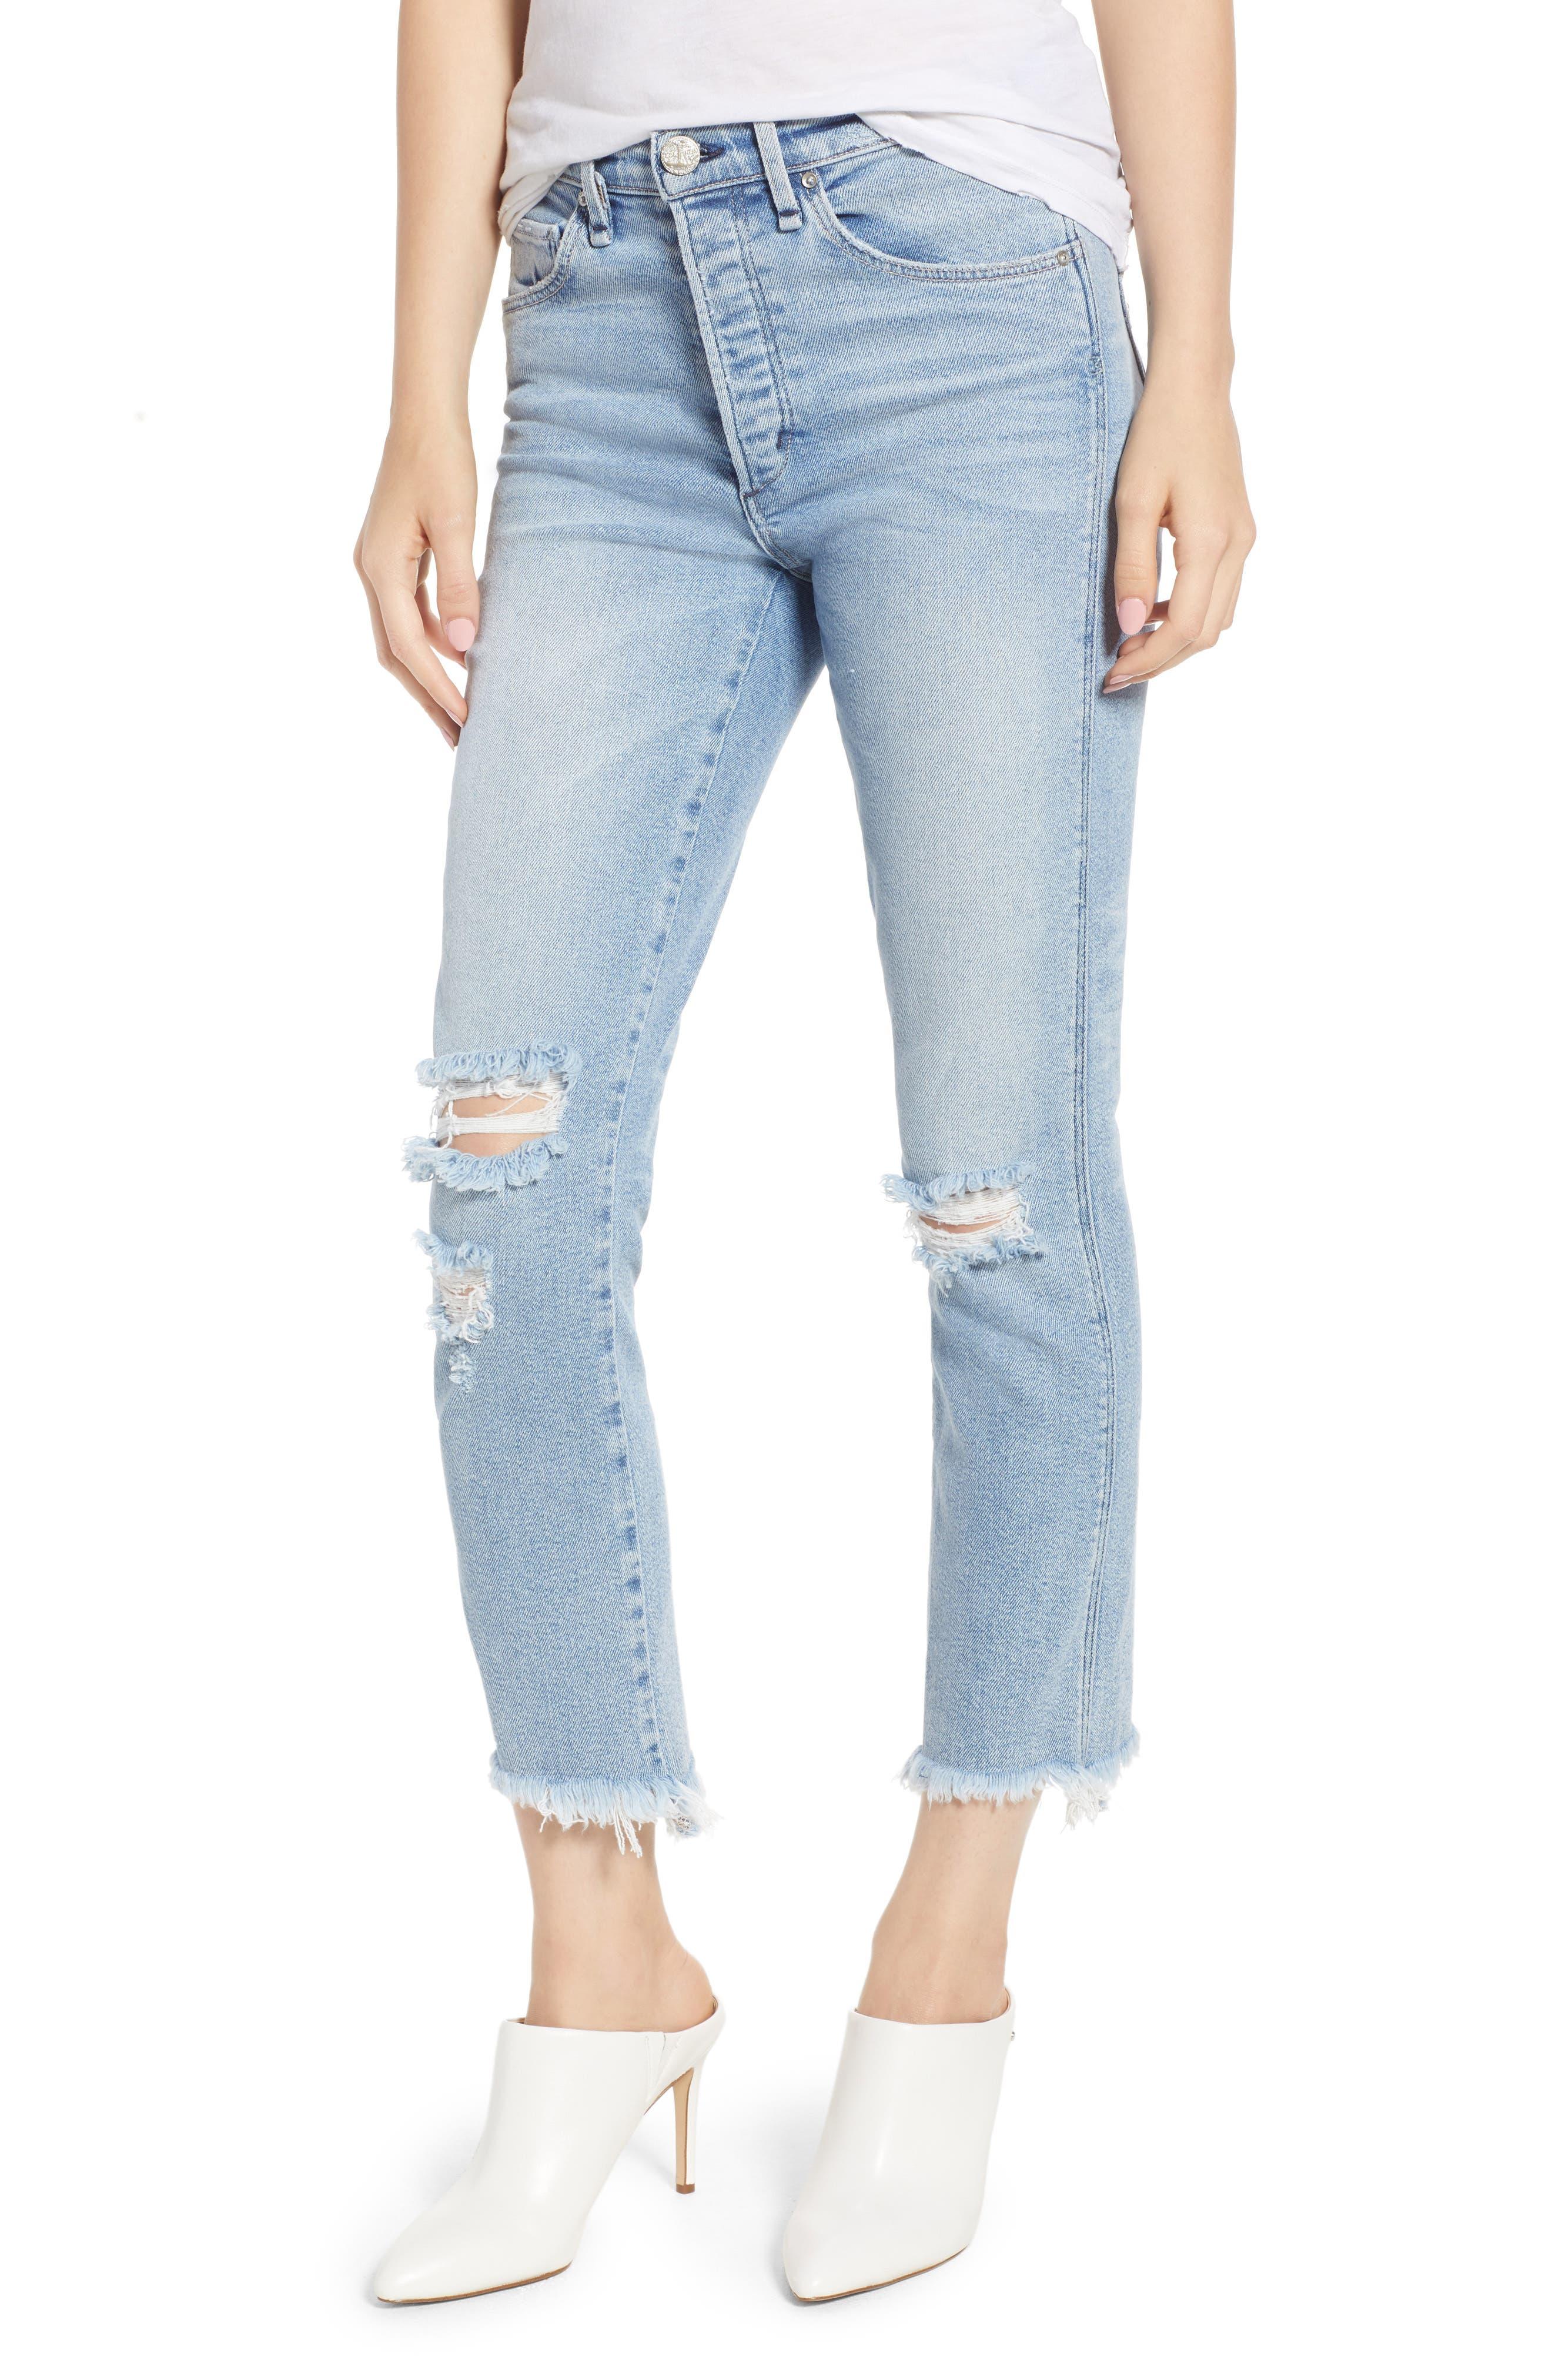 Valetta High Waist Crop Straight Leg Jeans,                             Main thumbnail 1, color,                             450